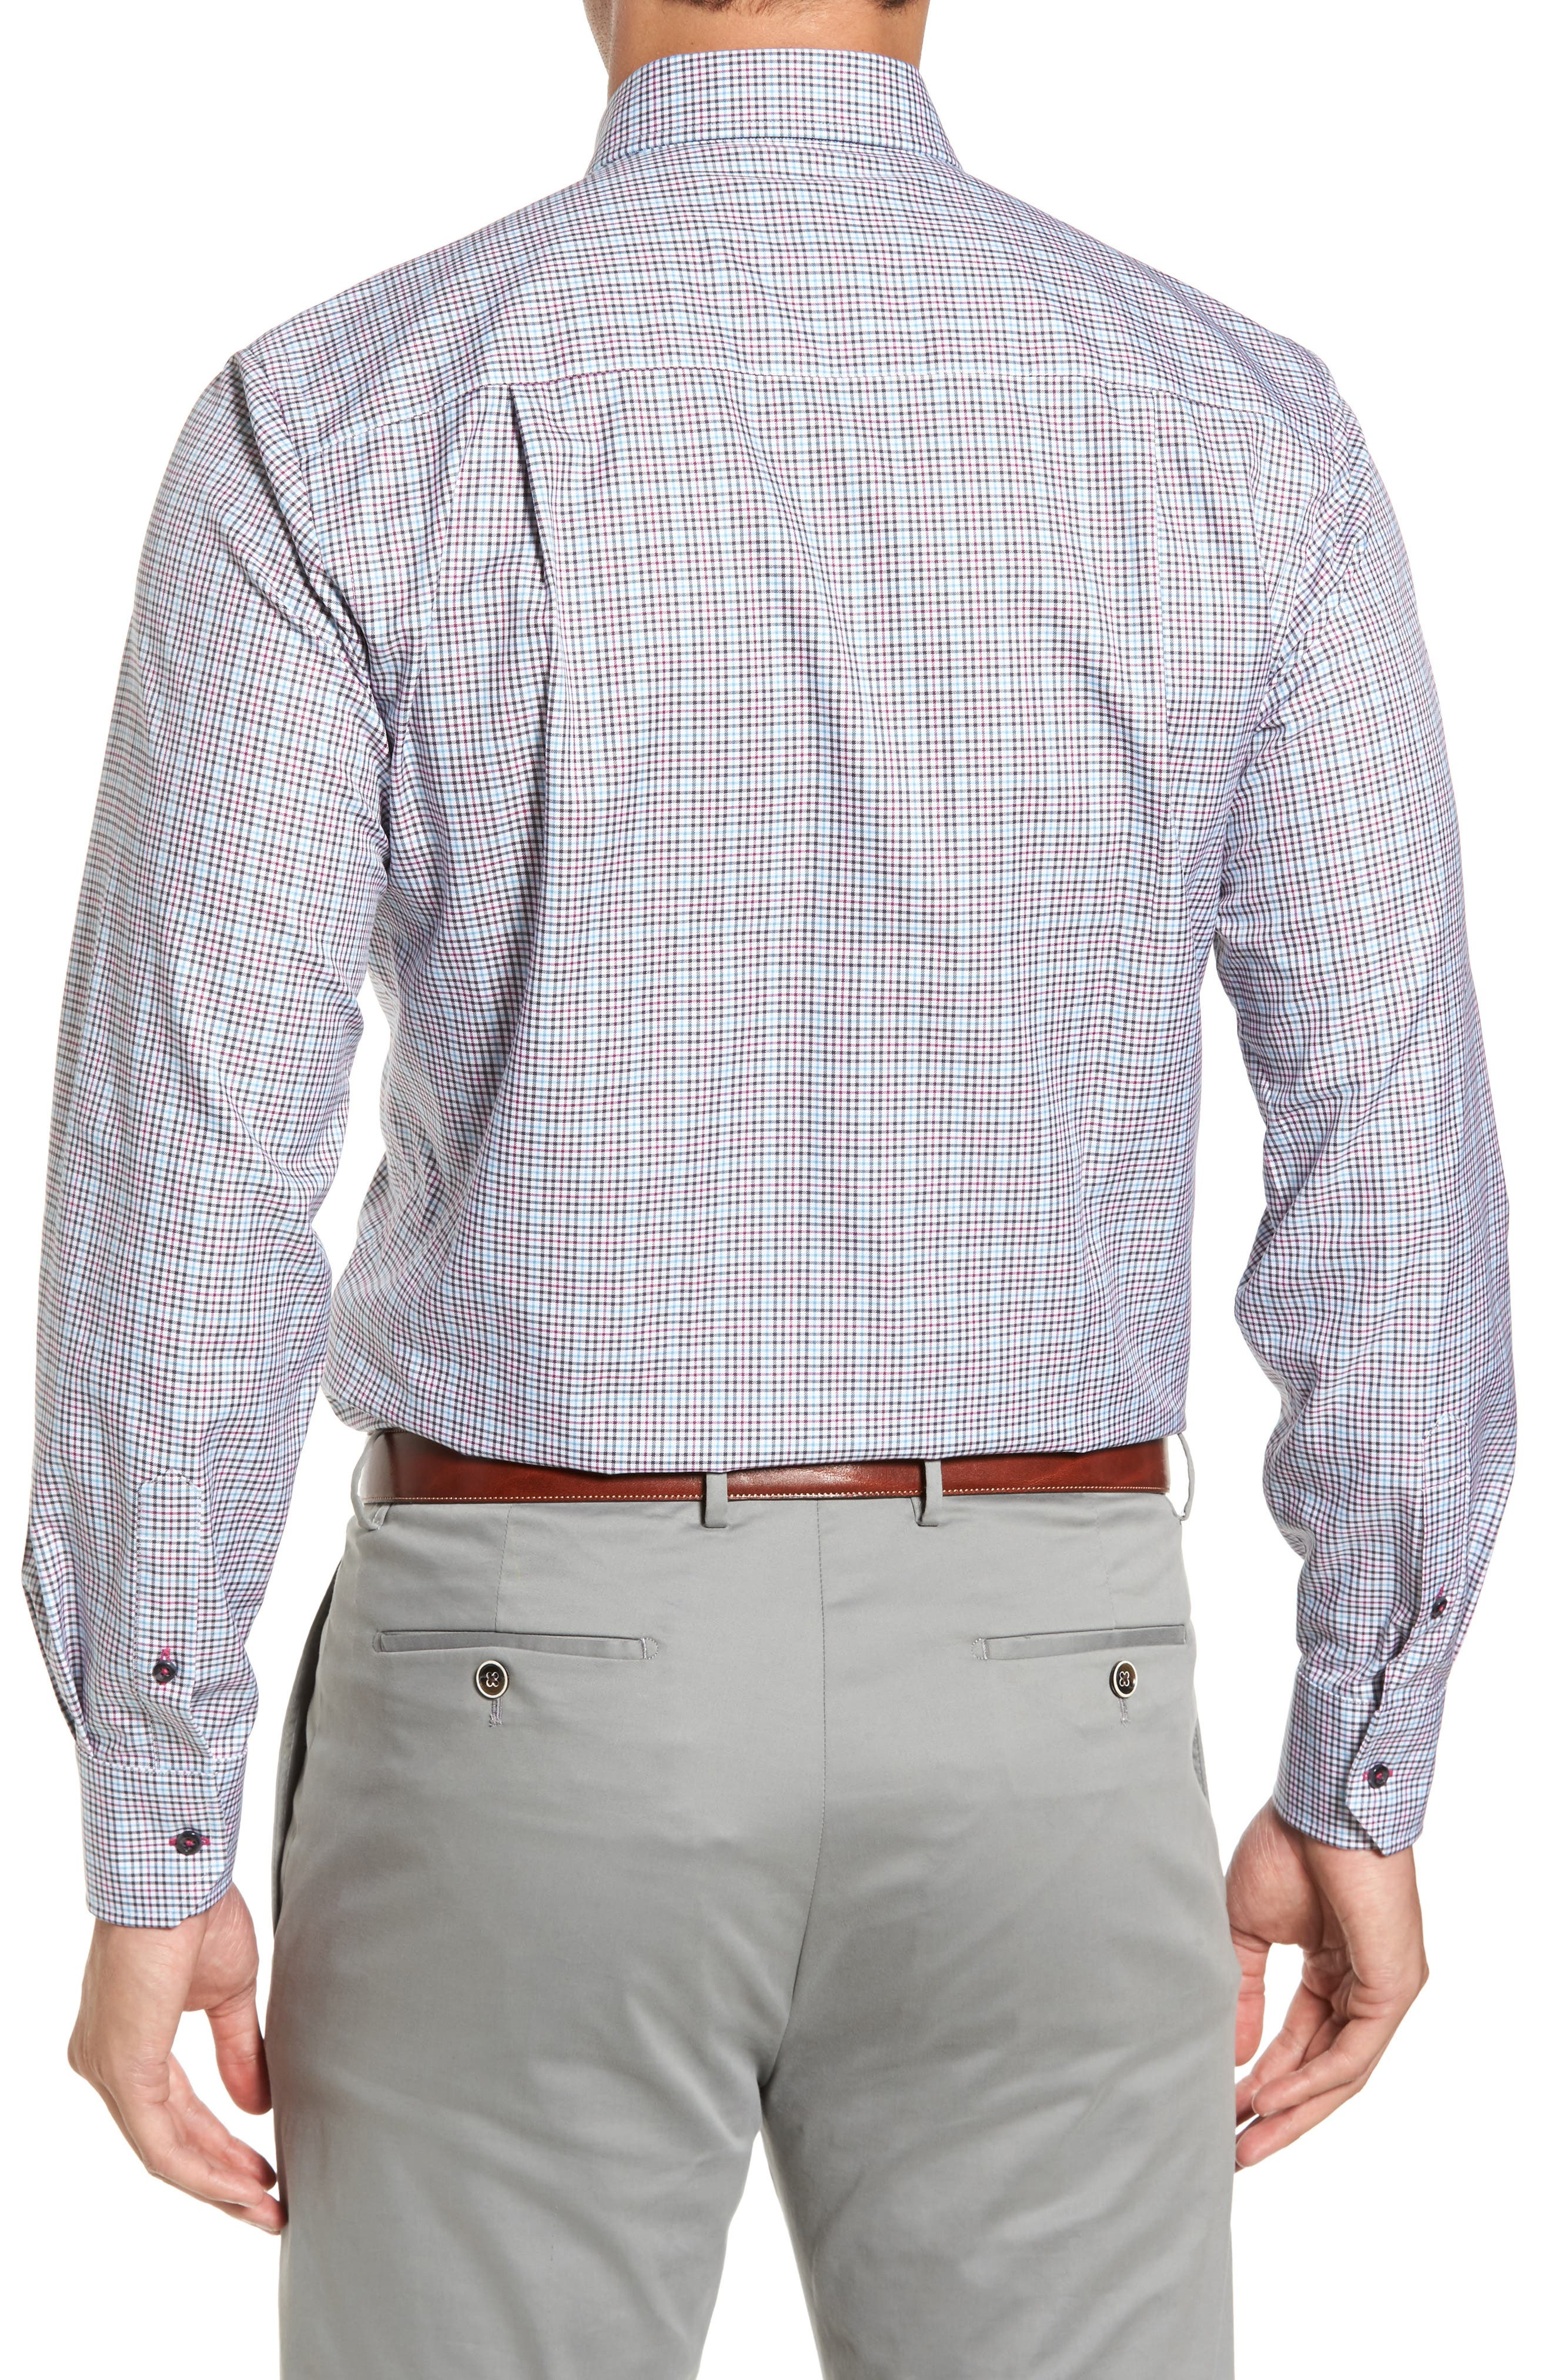 Regular Fit Plaid Sport Shirt,                             Alternate thumbnail 2, color,                             020